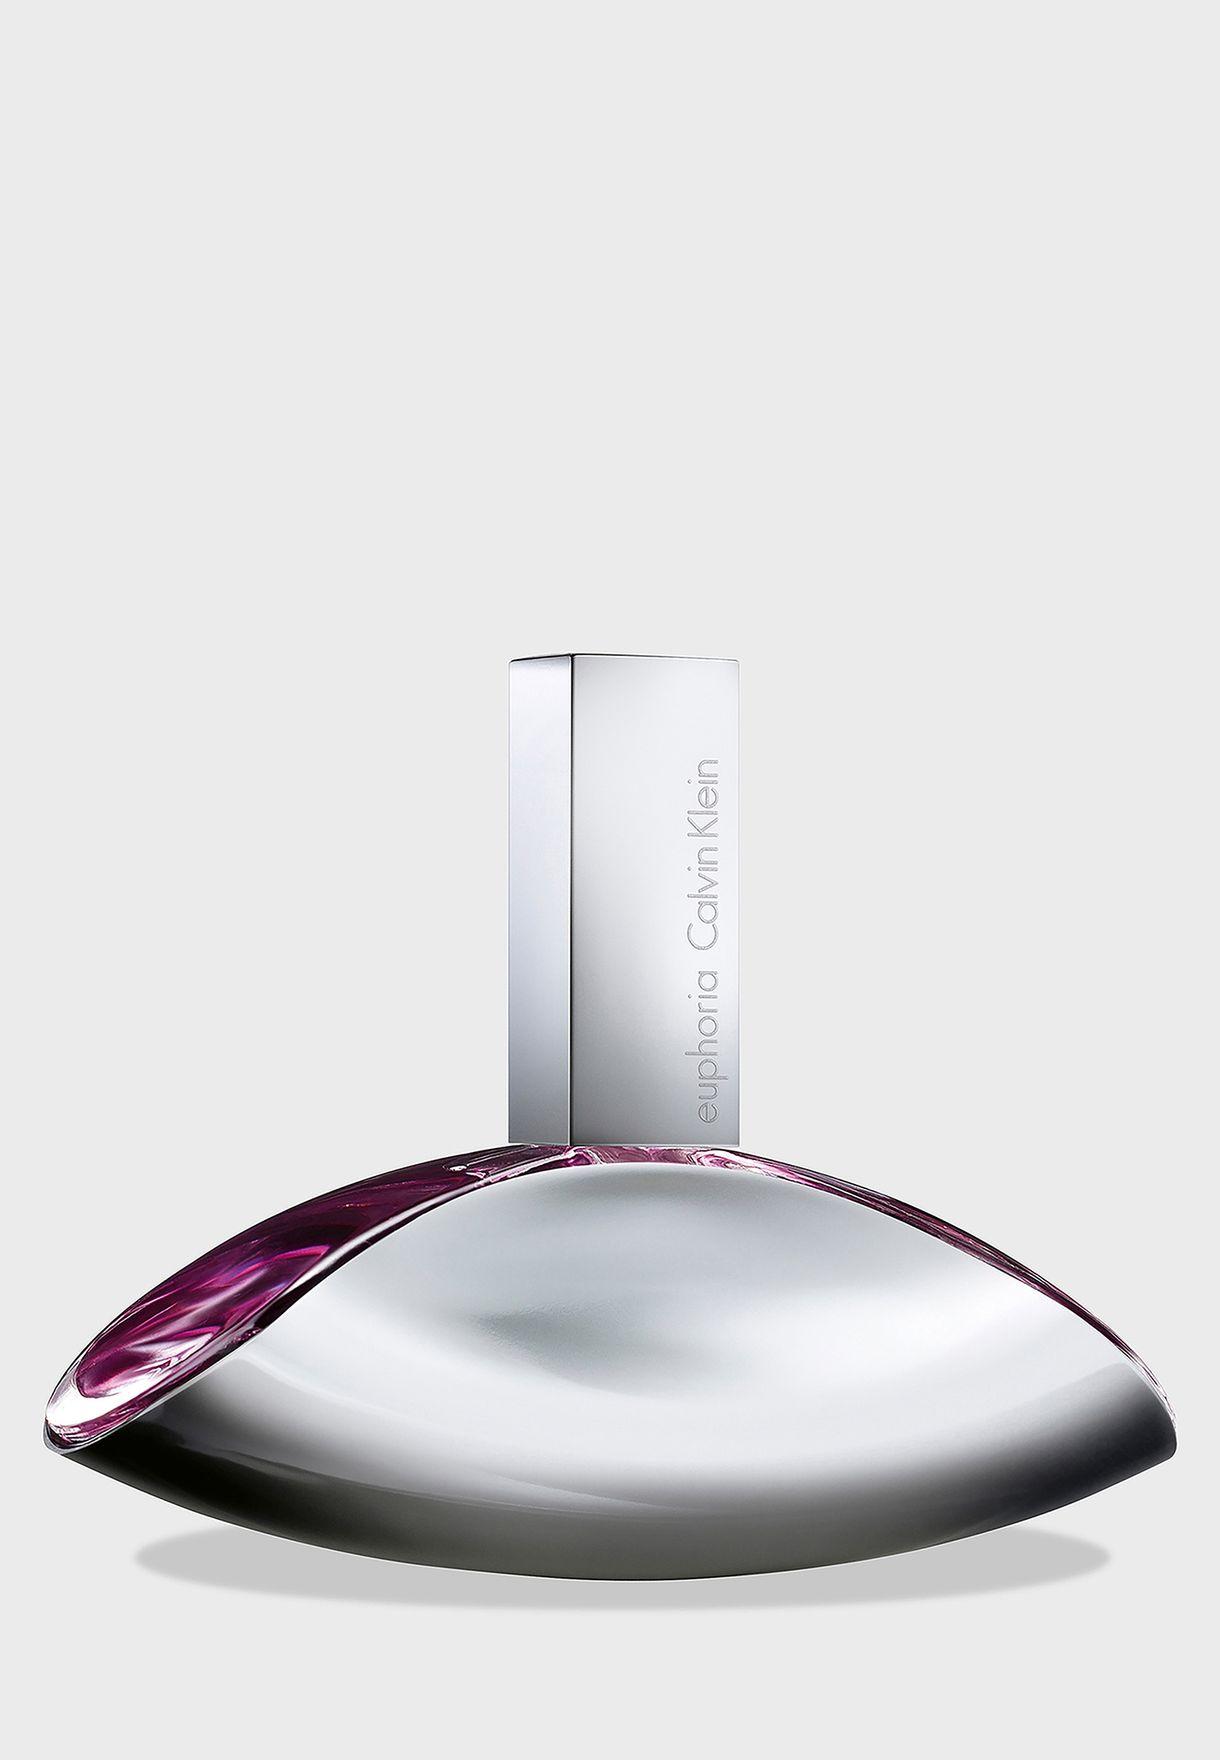 Euphoria For Women Eau De Parfum 100ml